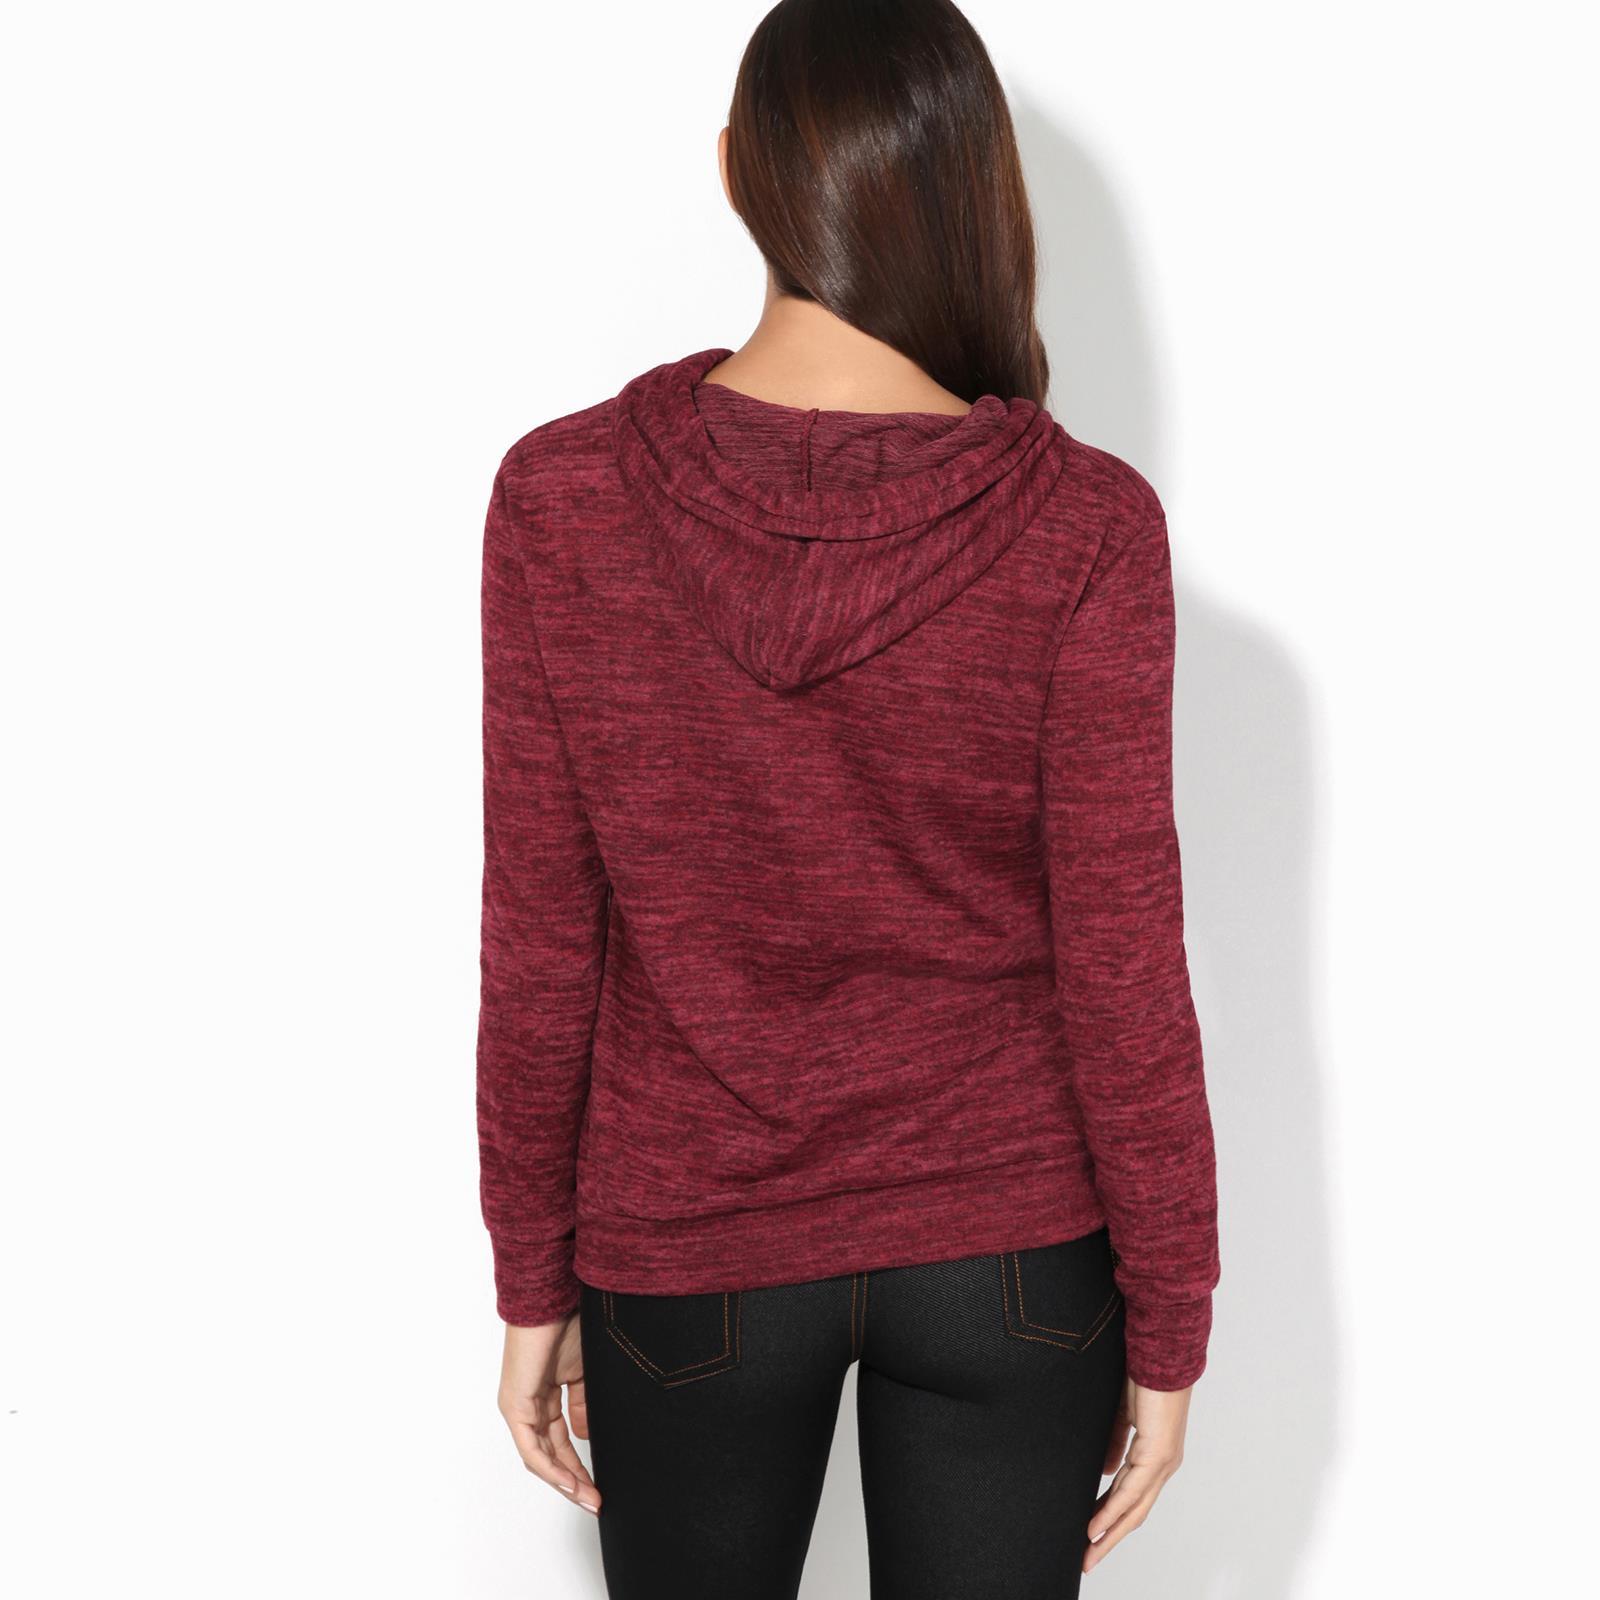 Womens-Soft-Marl-Knit-Hoodie-Hooded-Loose-Baggy-Jumper-Sweater-Top-Sweatshirt thumbnail 15